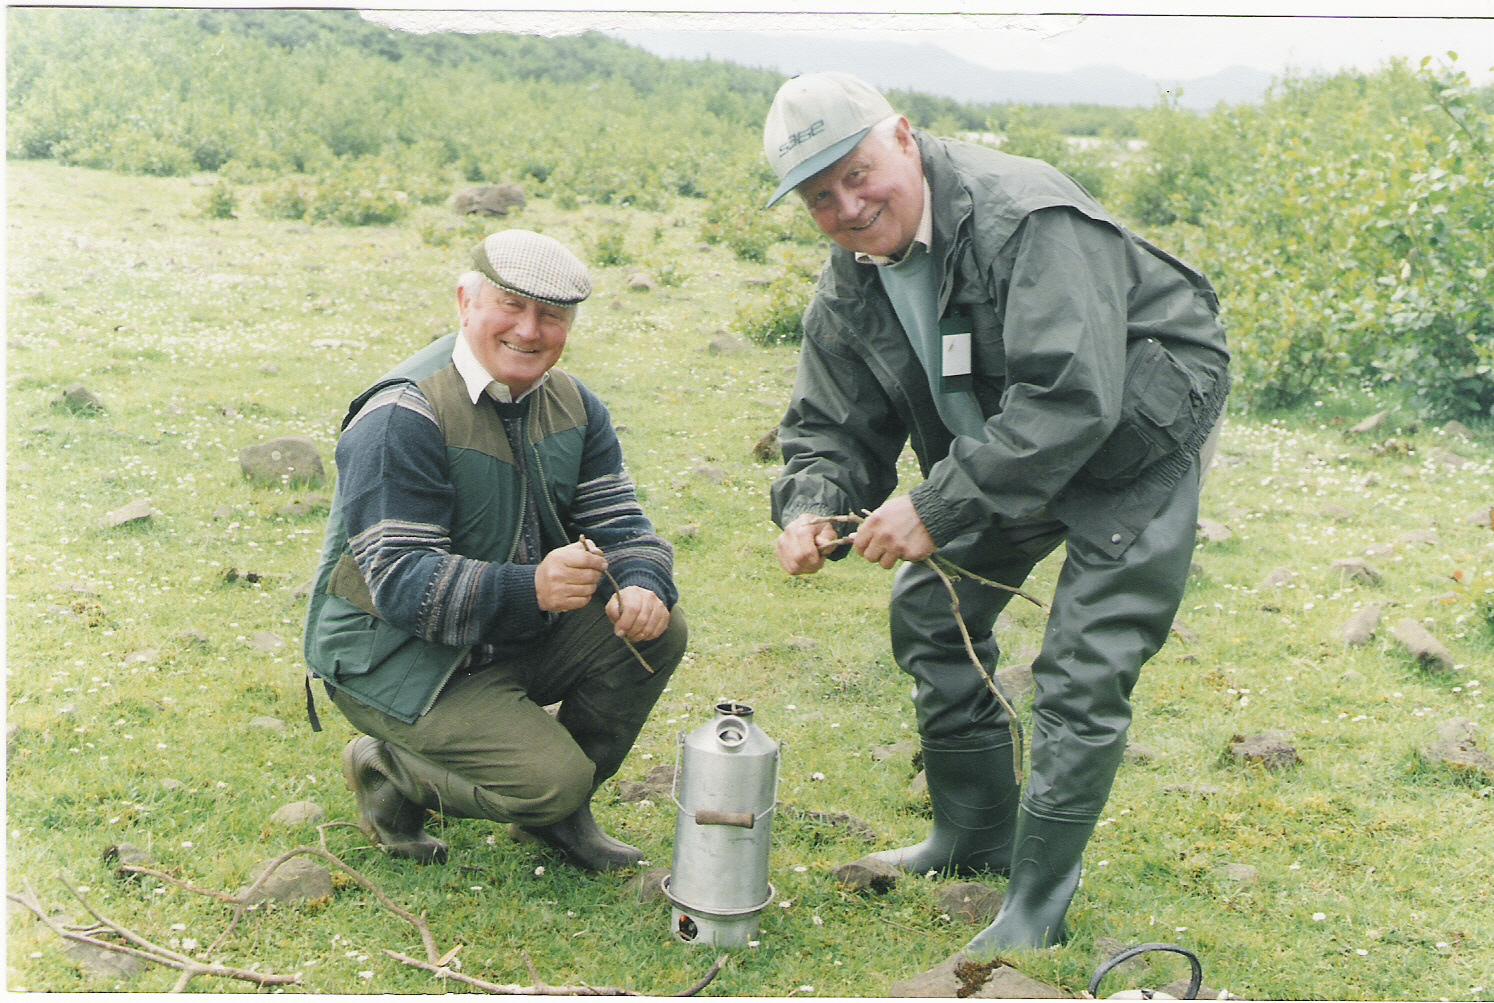 Founding Fathers - Padraig Kelly & Frank Ellis - Lough Conn, Ireland